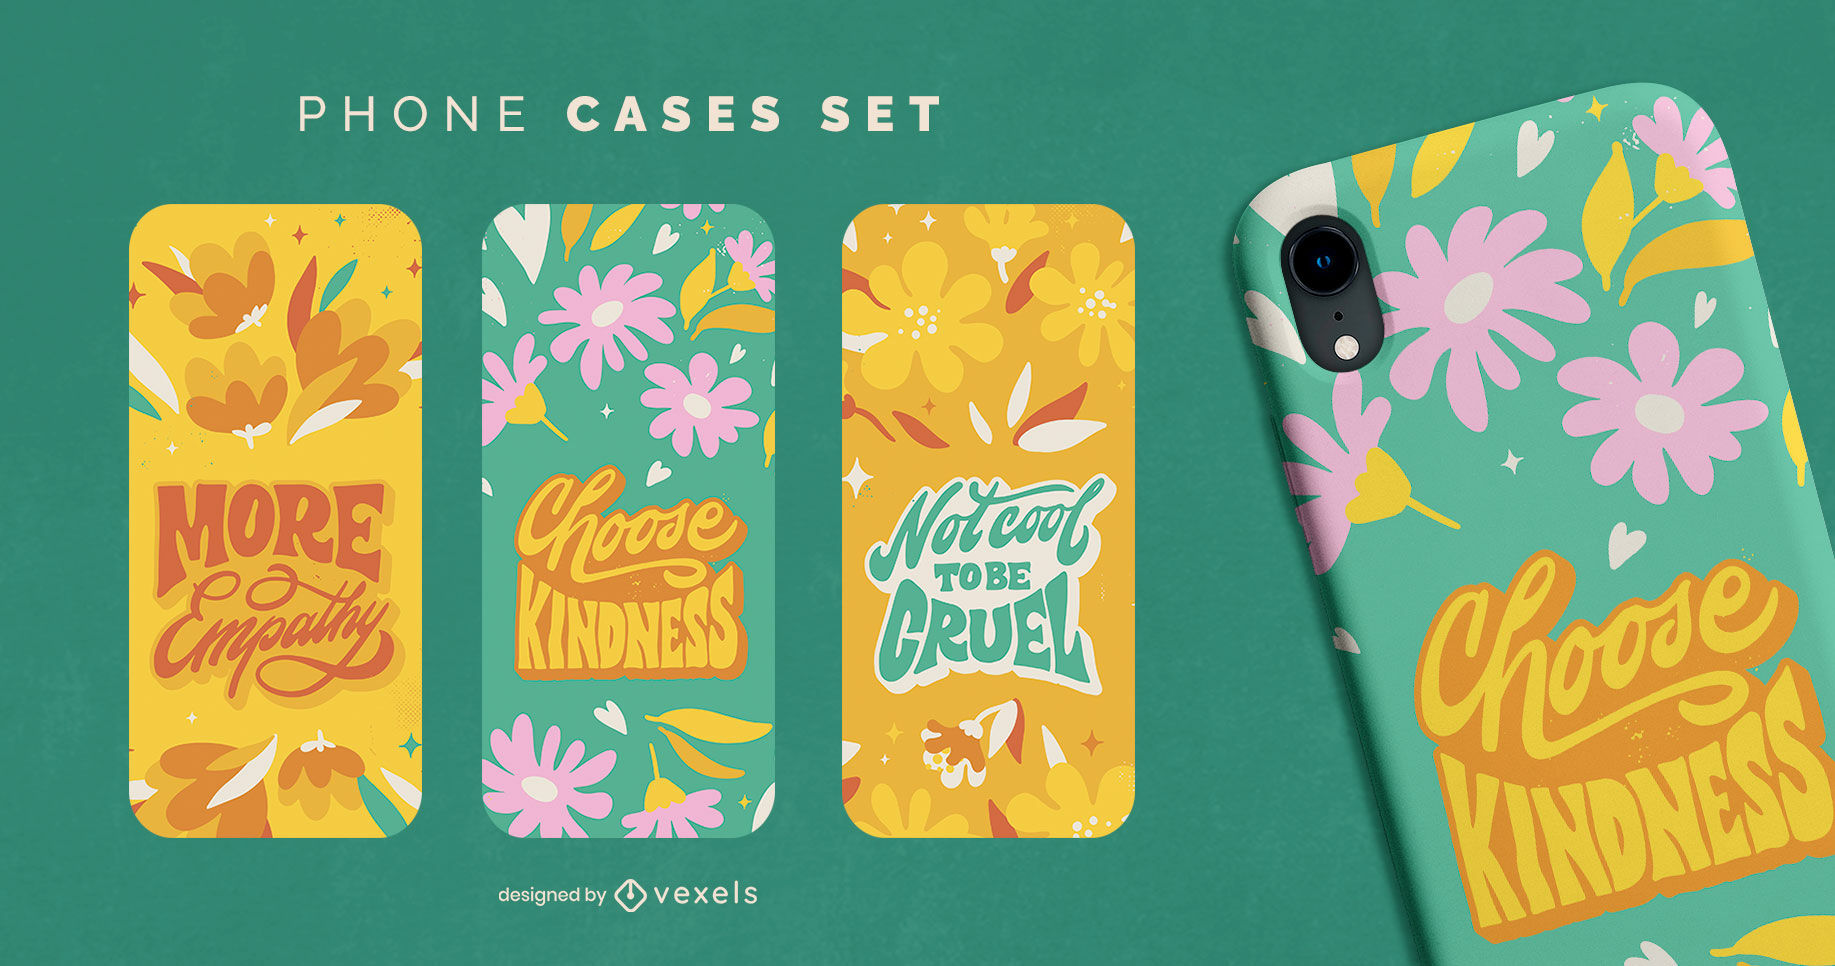 Neurodiversity quotes phone cases set design